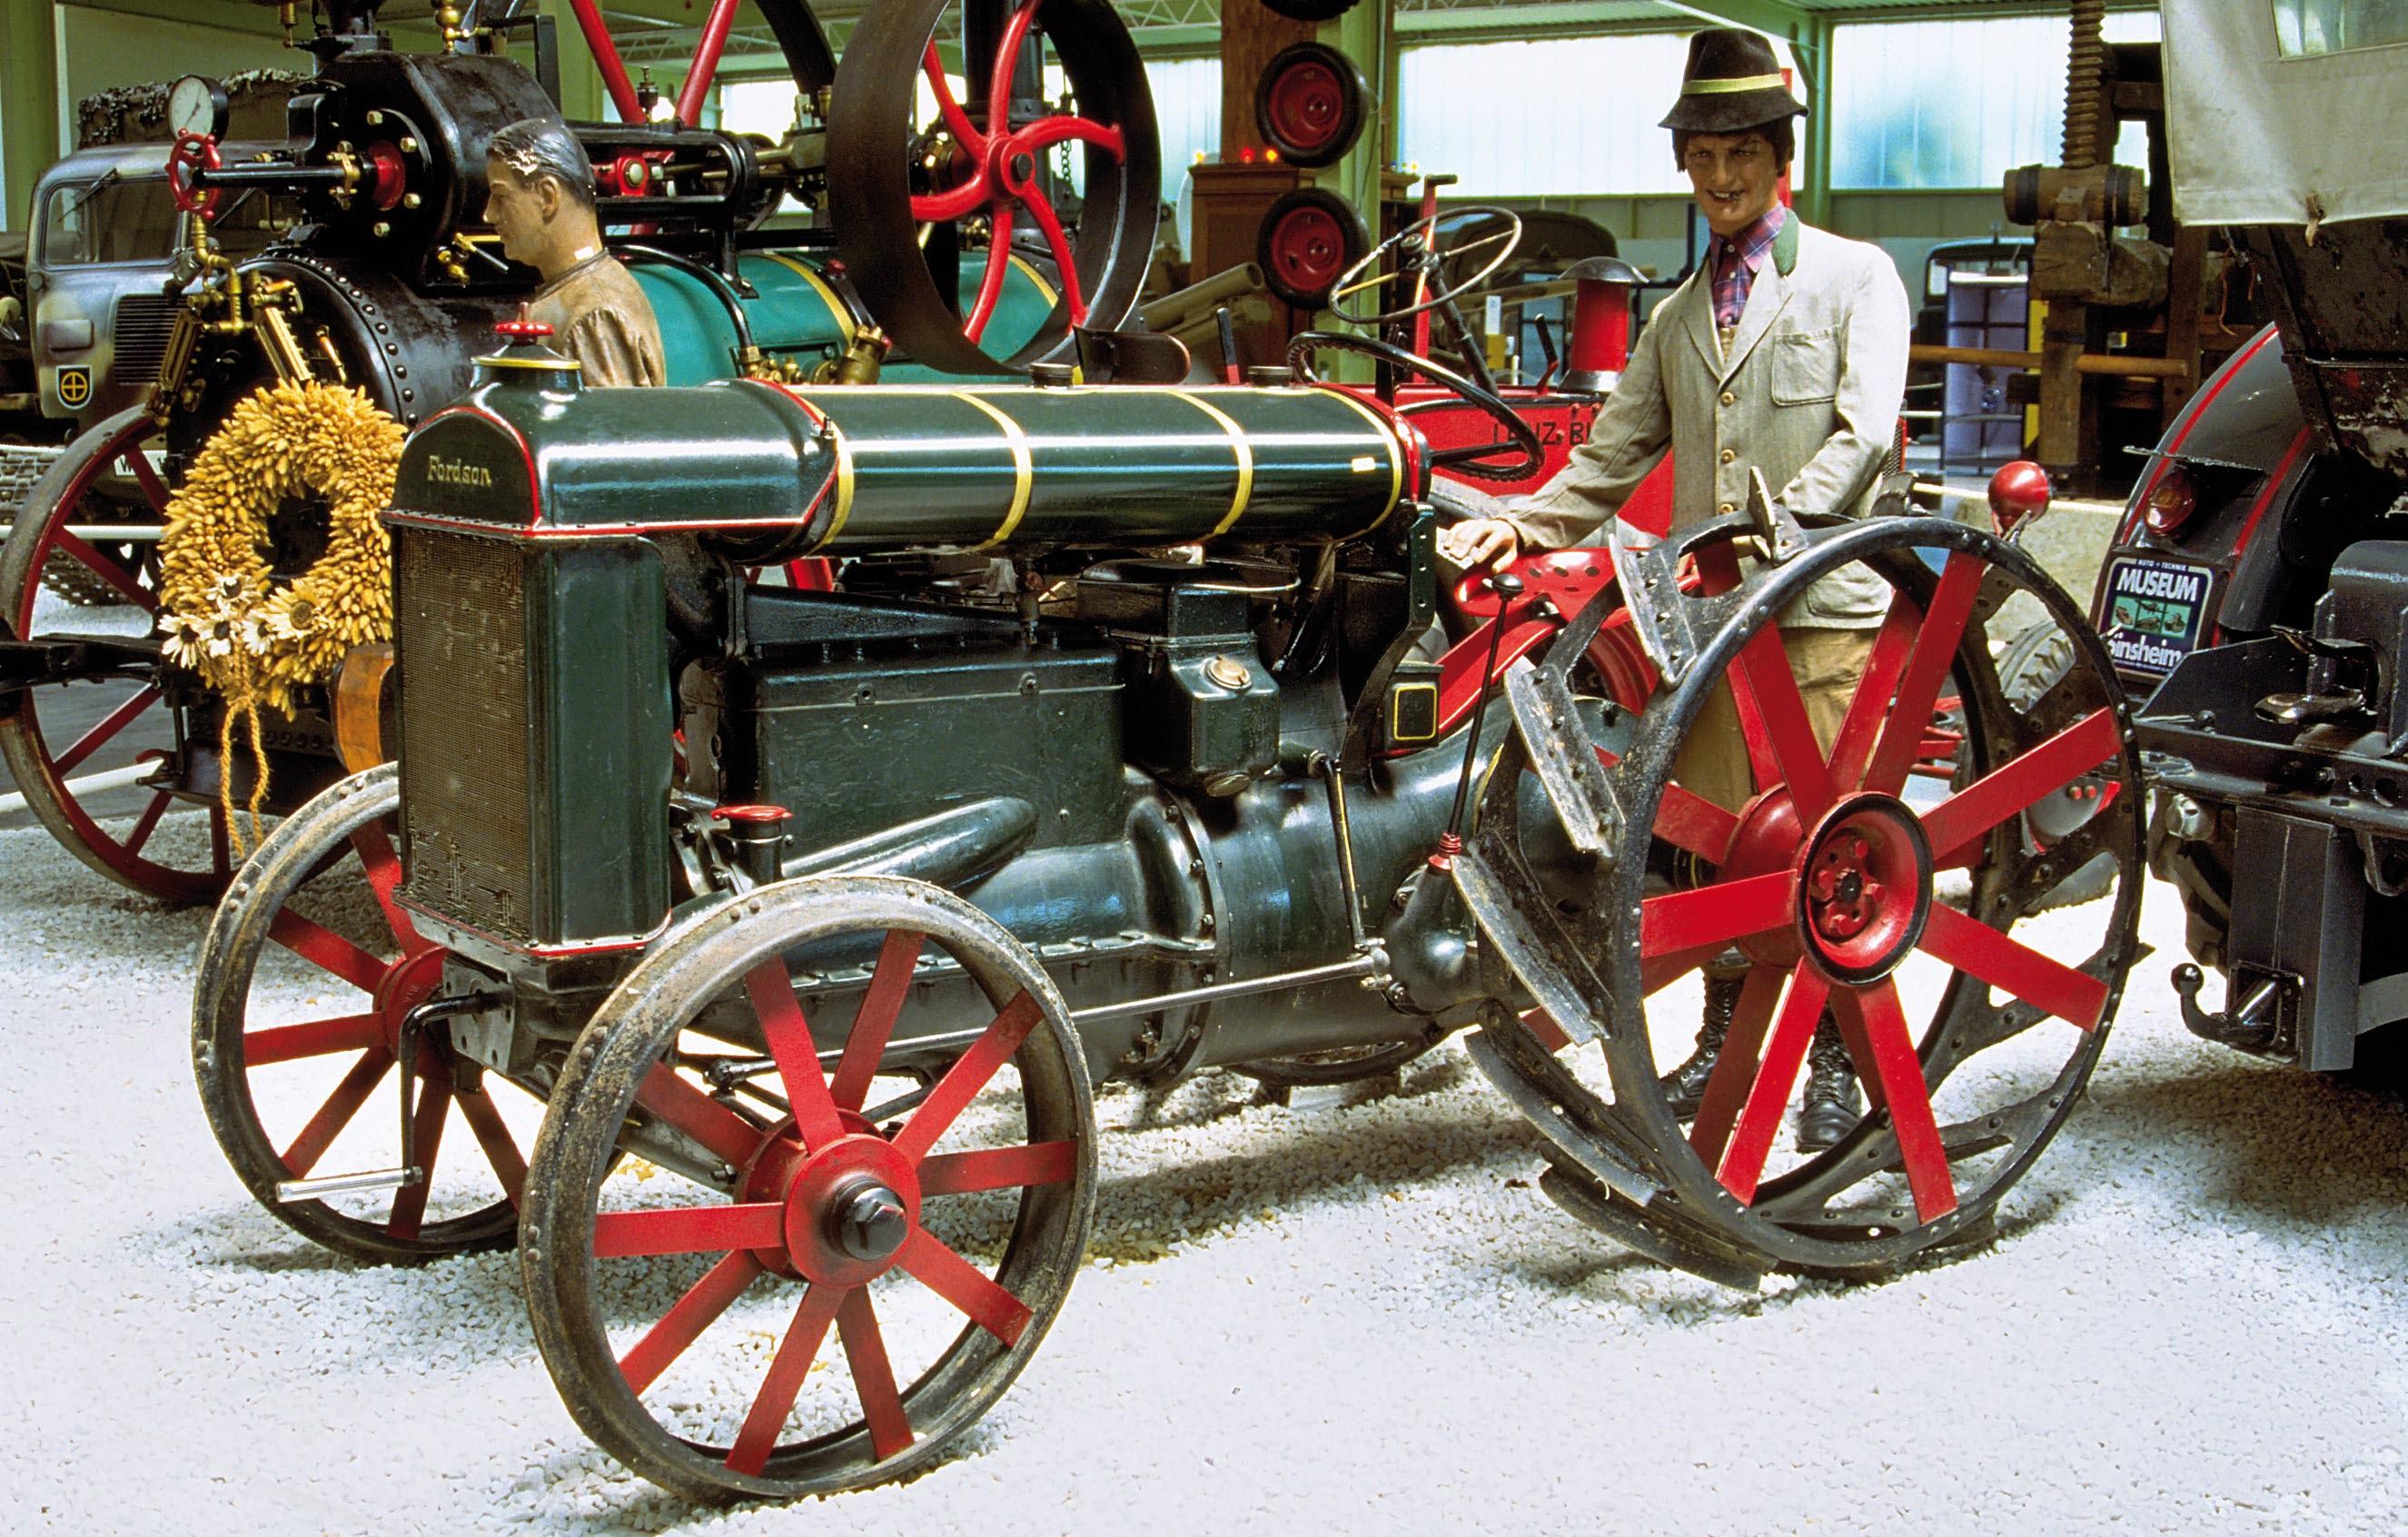 Fordson Tractor | Technik Museum Sinsheim | Germany